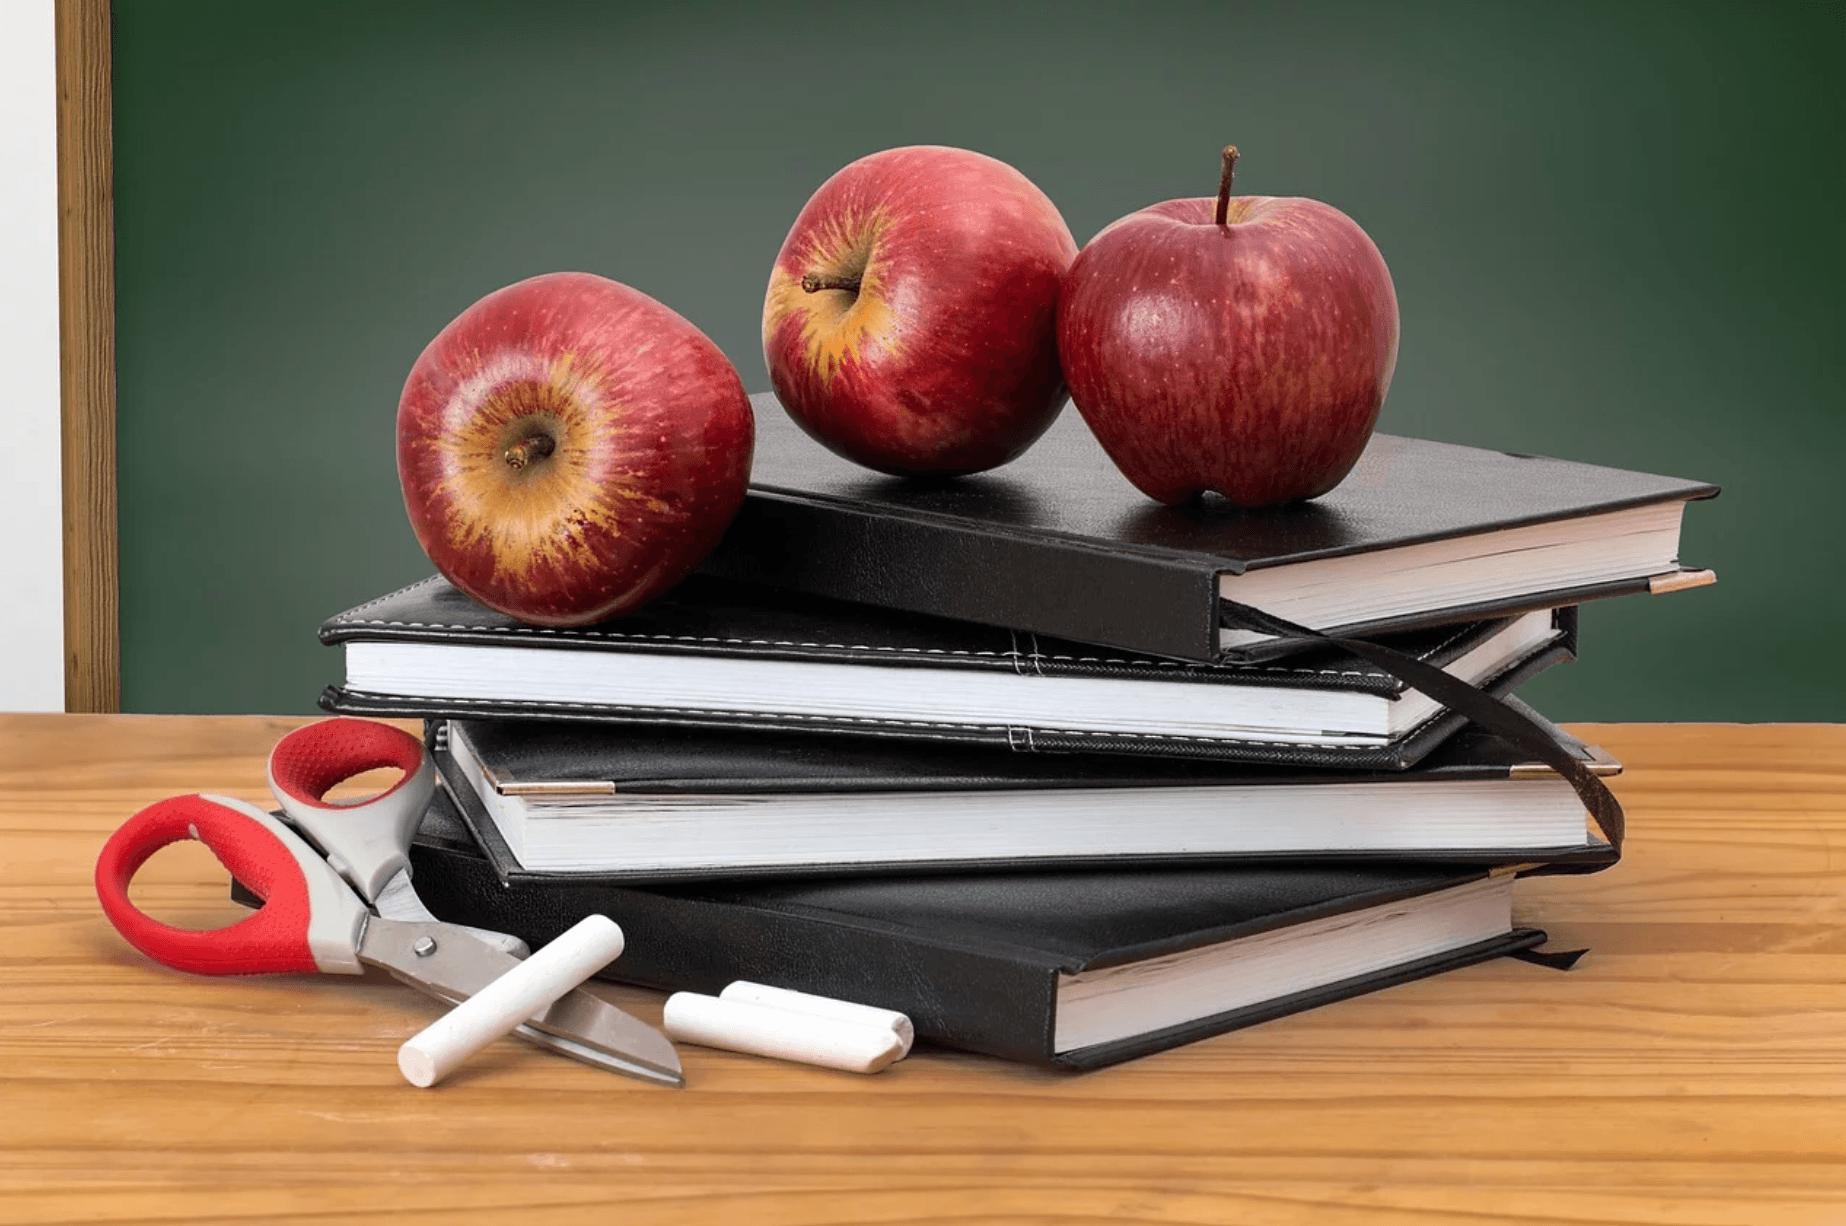 Sixth grade teacher asks class uncomfortable question — has student threatening her job